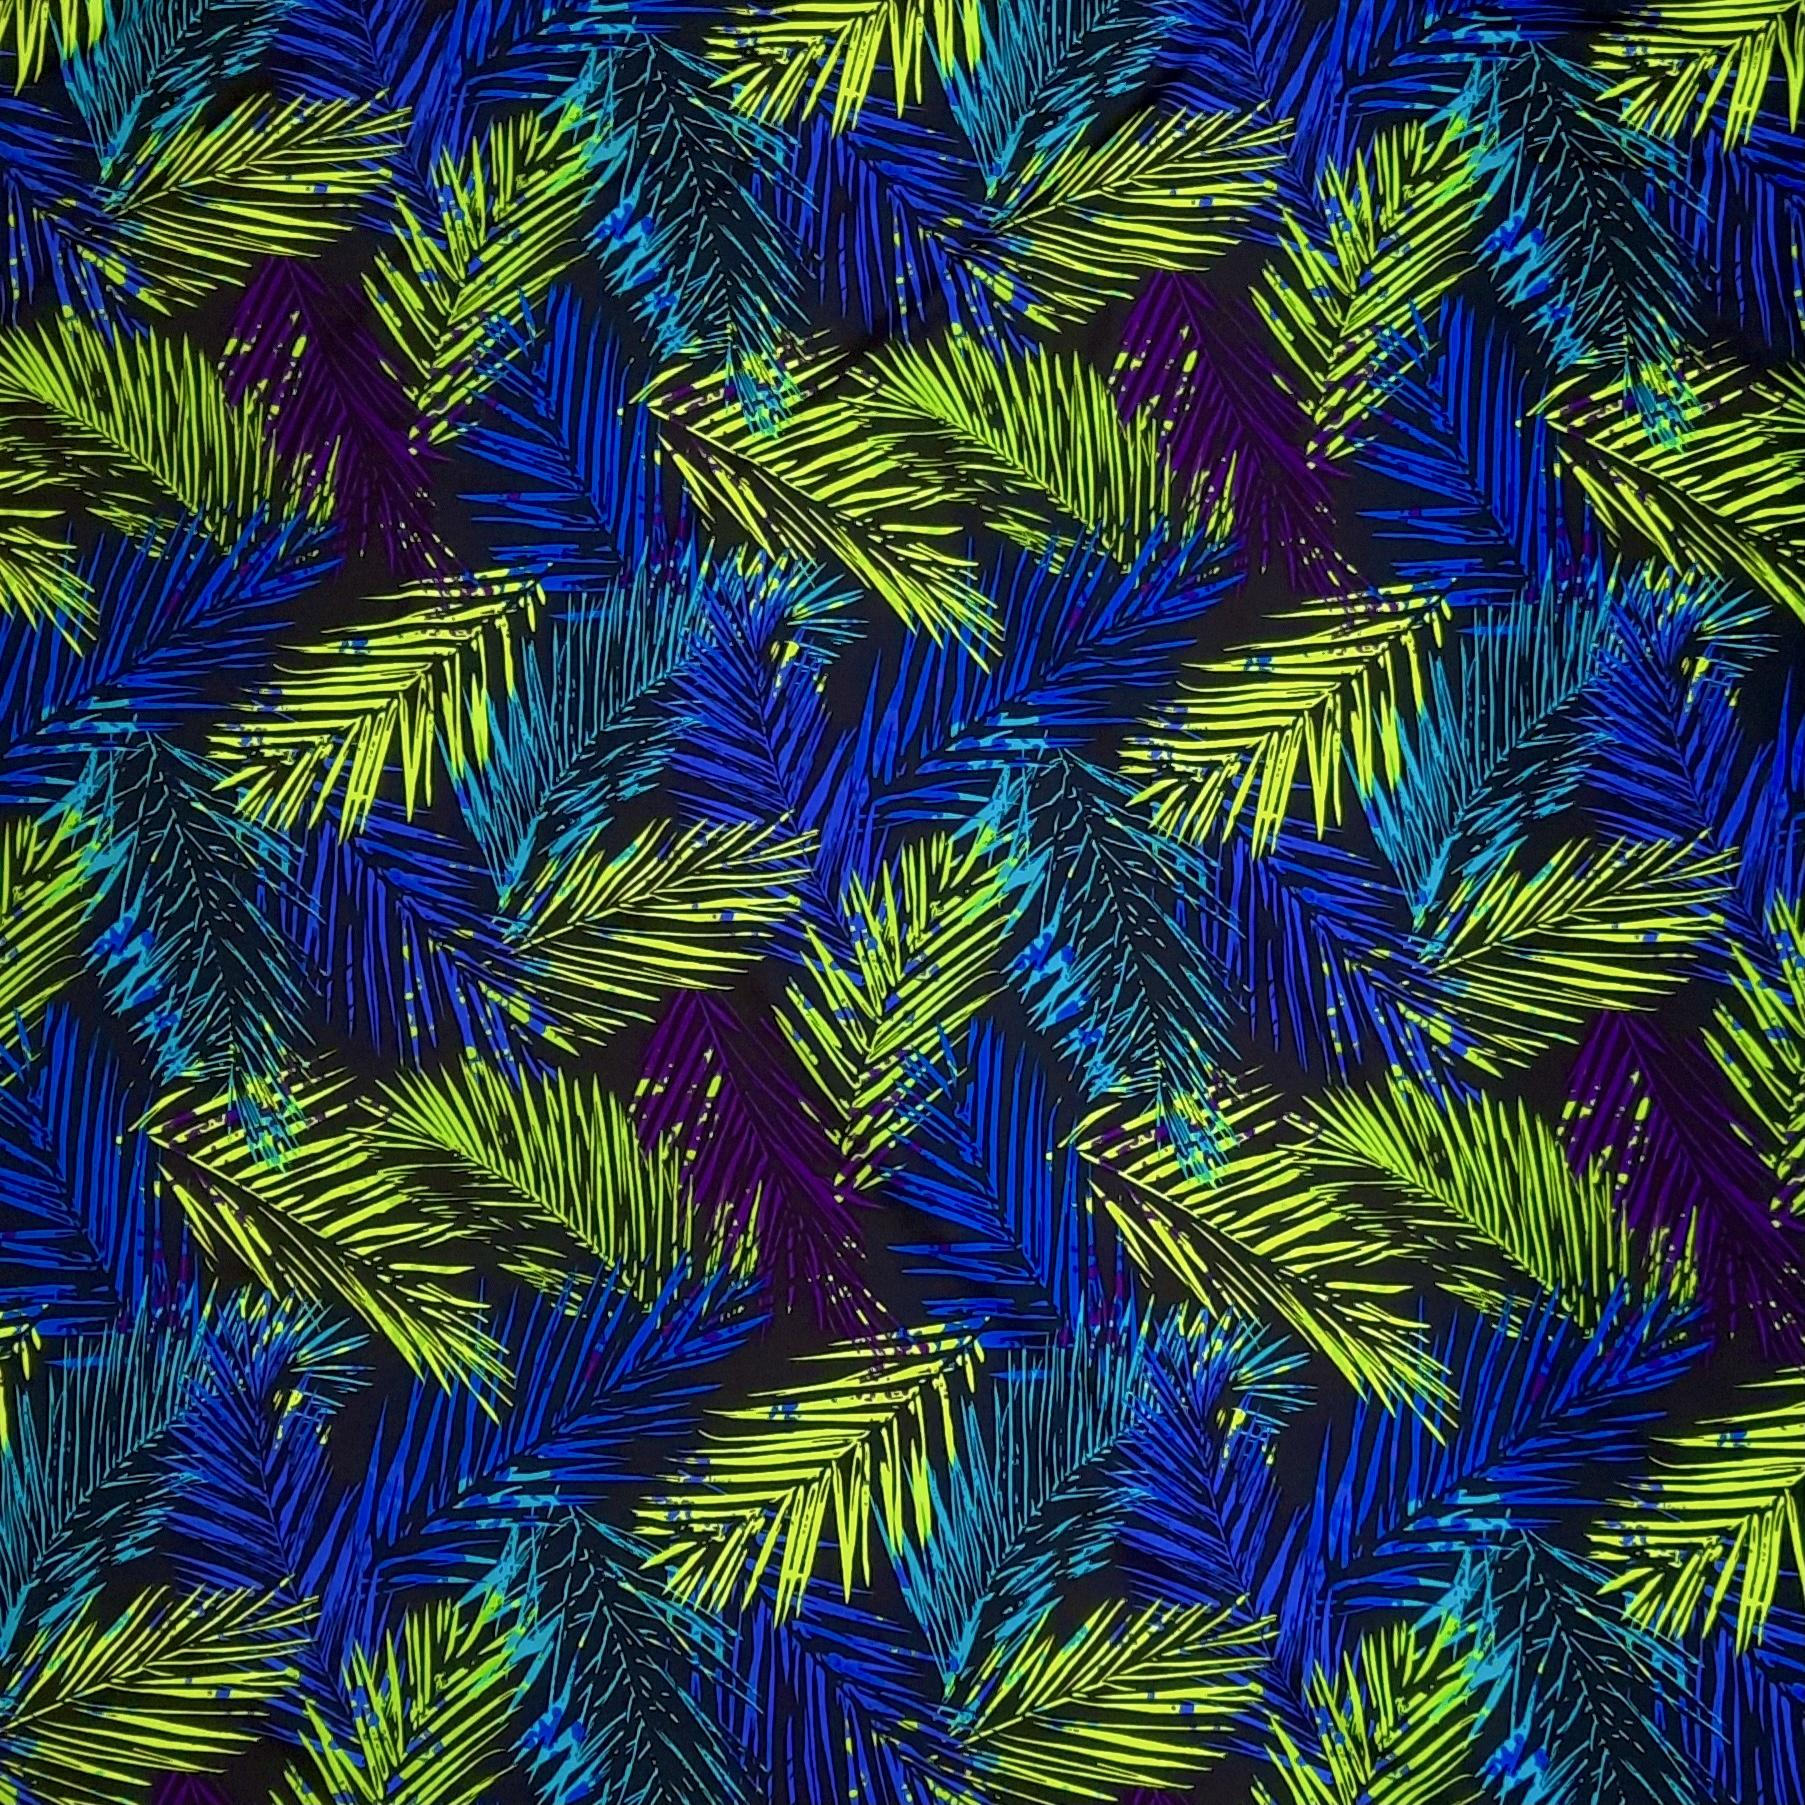 blueburstcropped.jpg